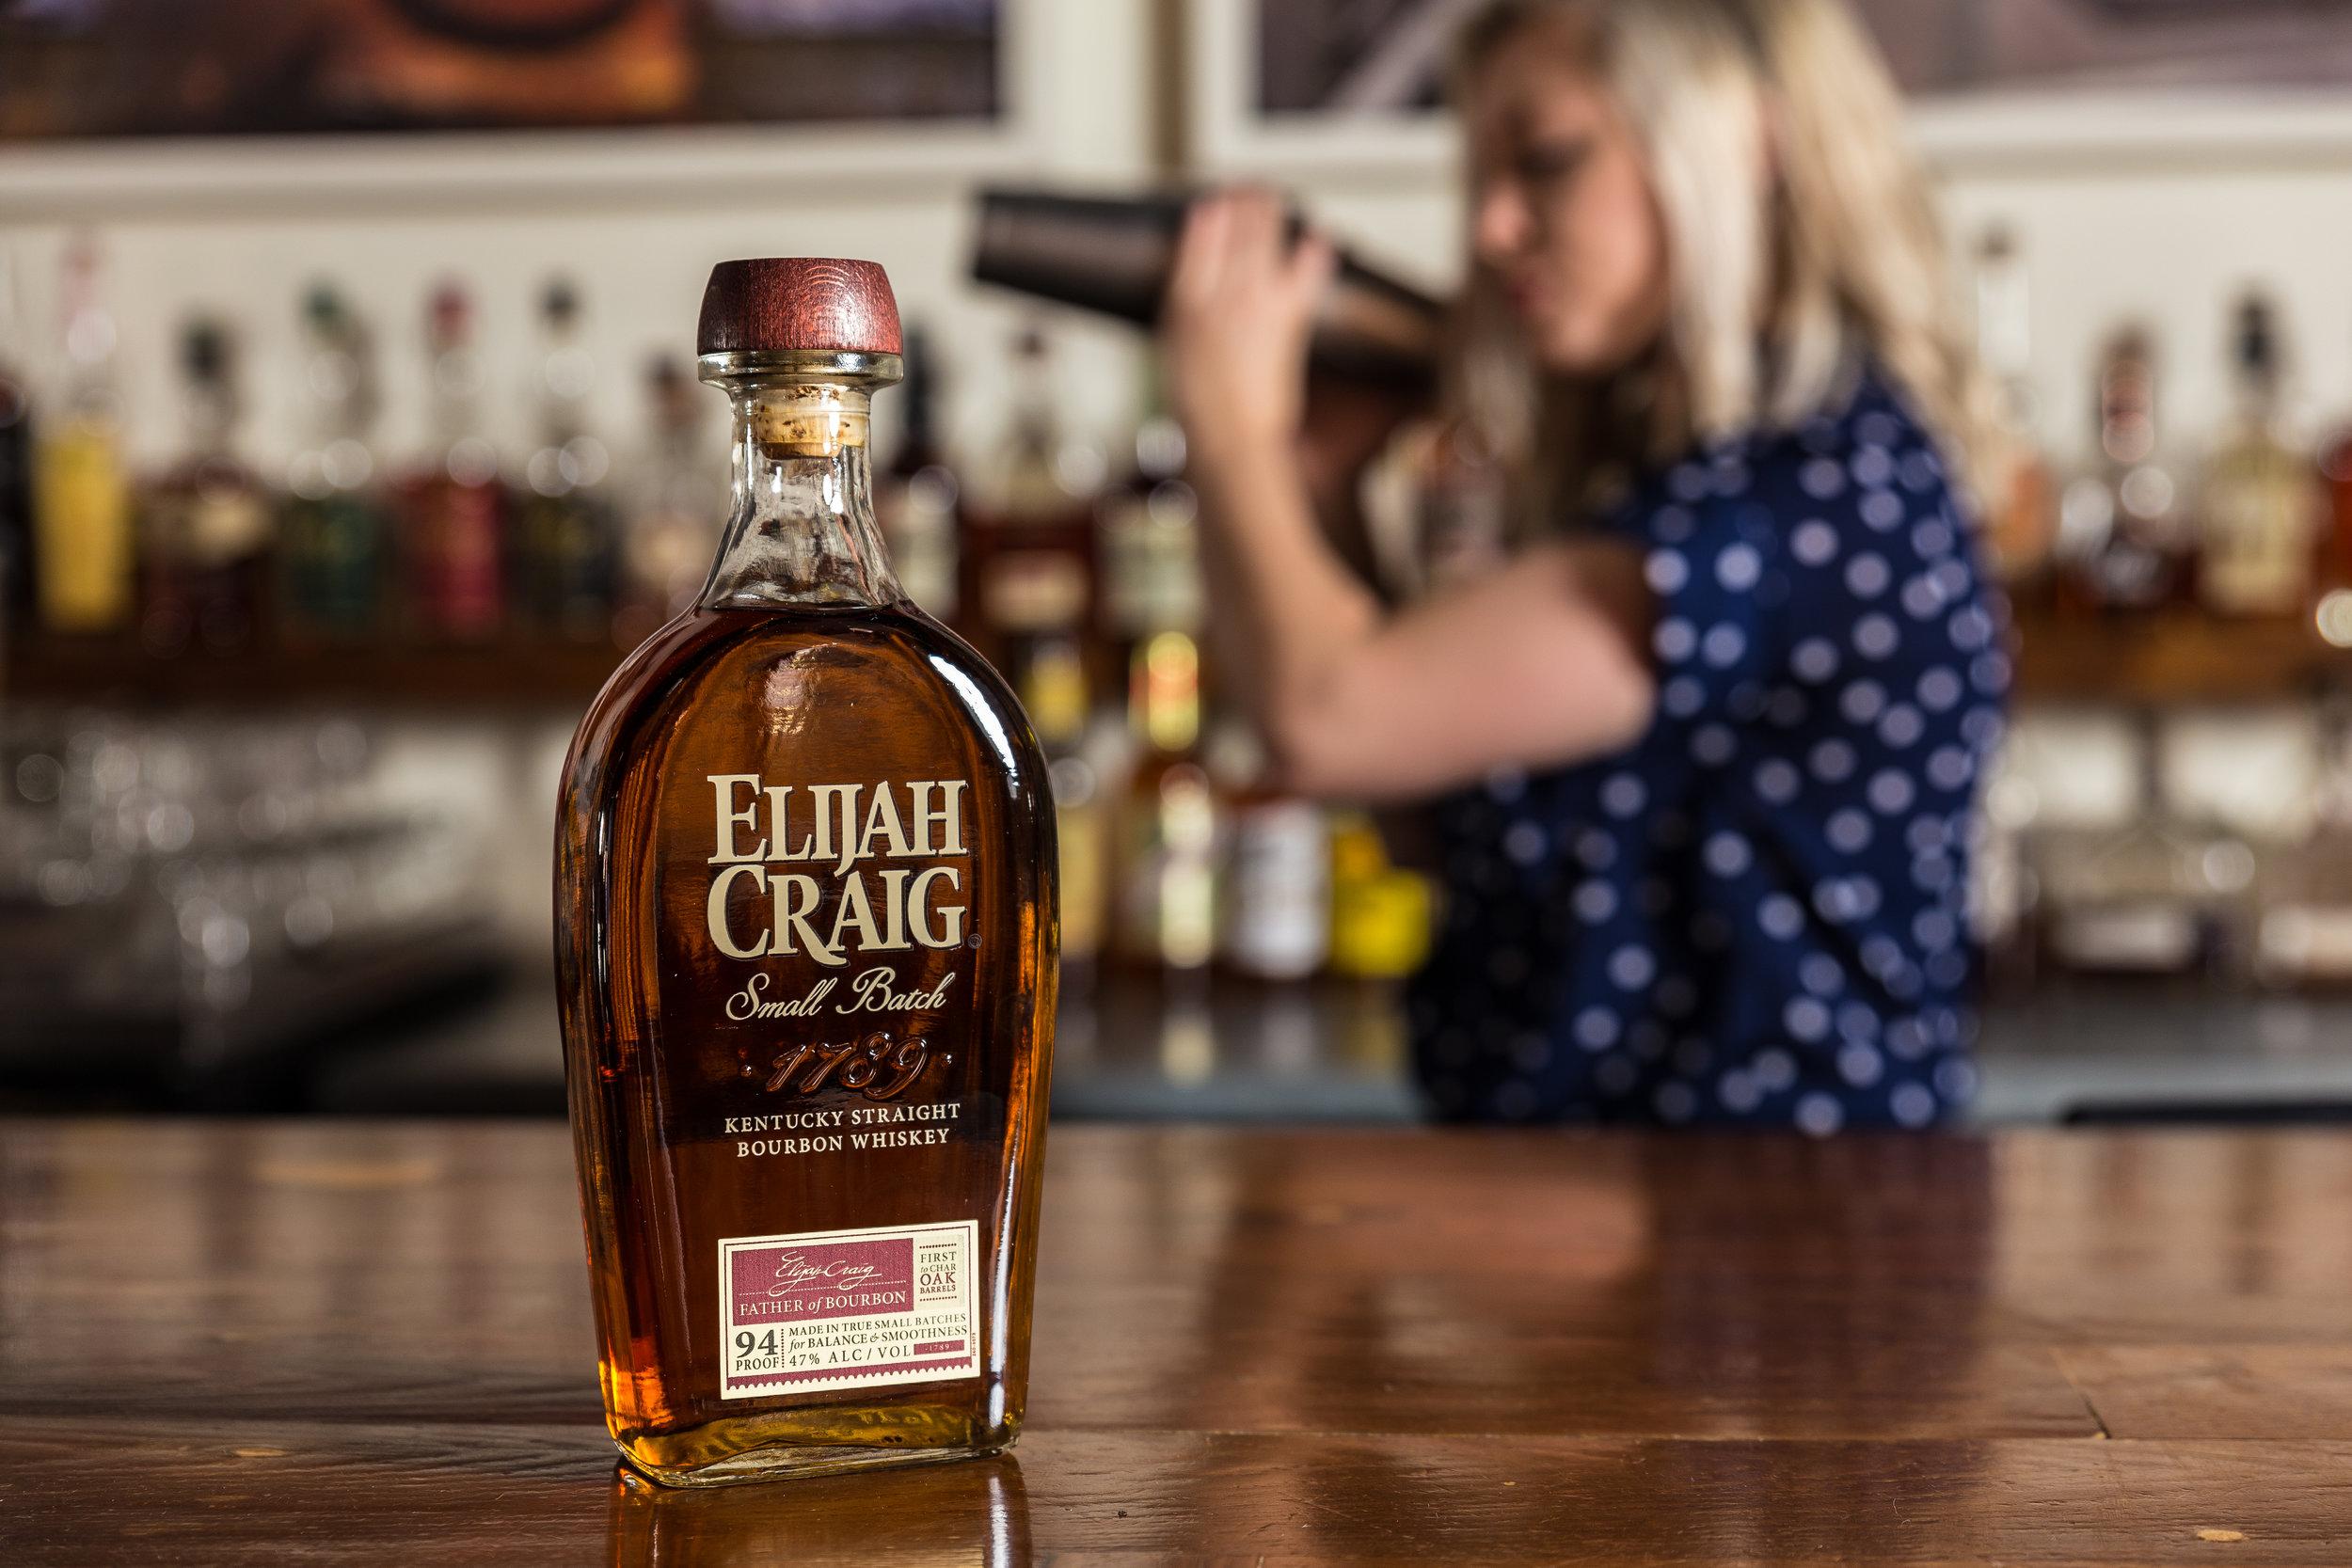 Elijah Craig Lifestyle